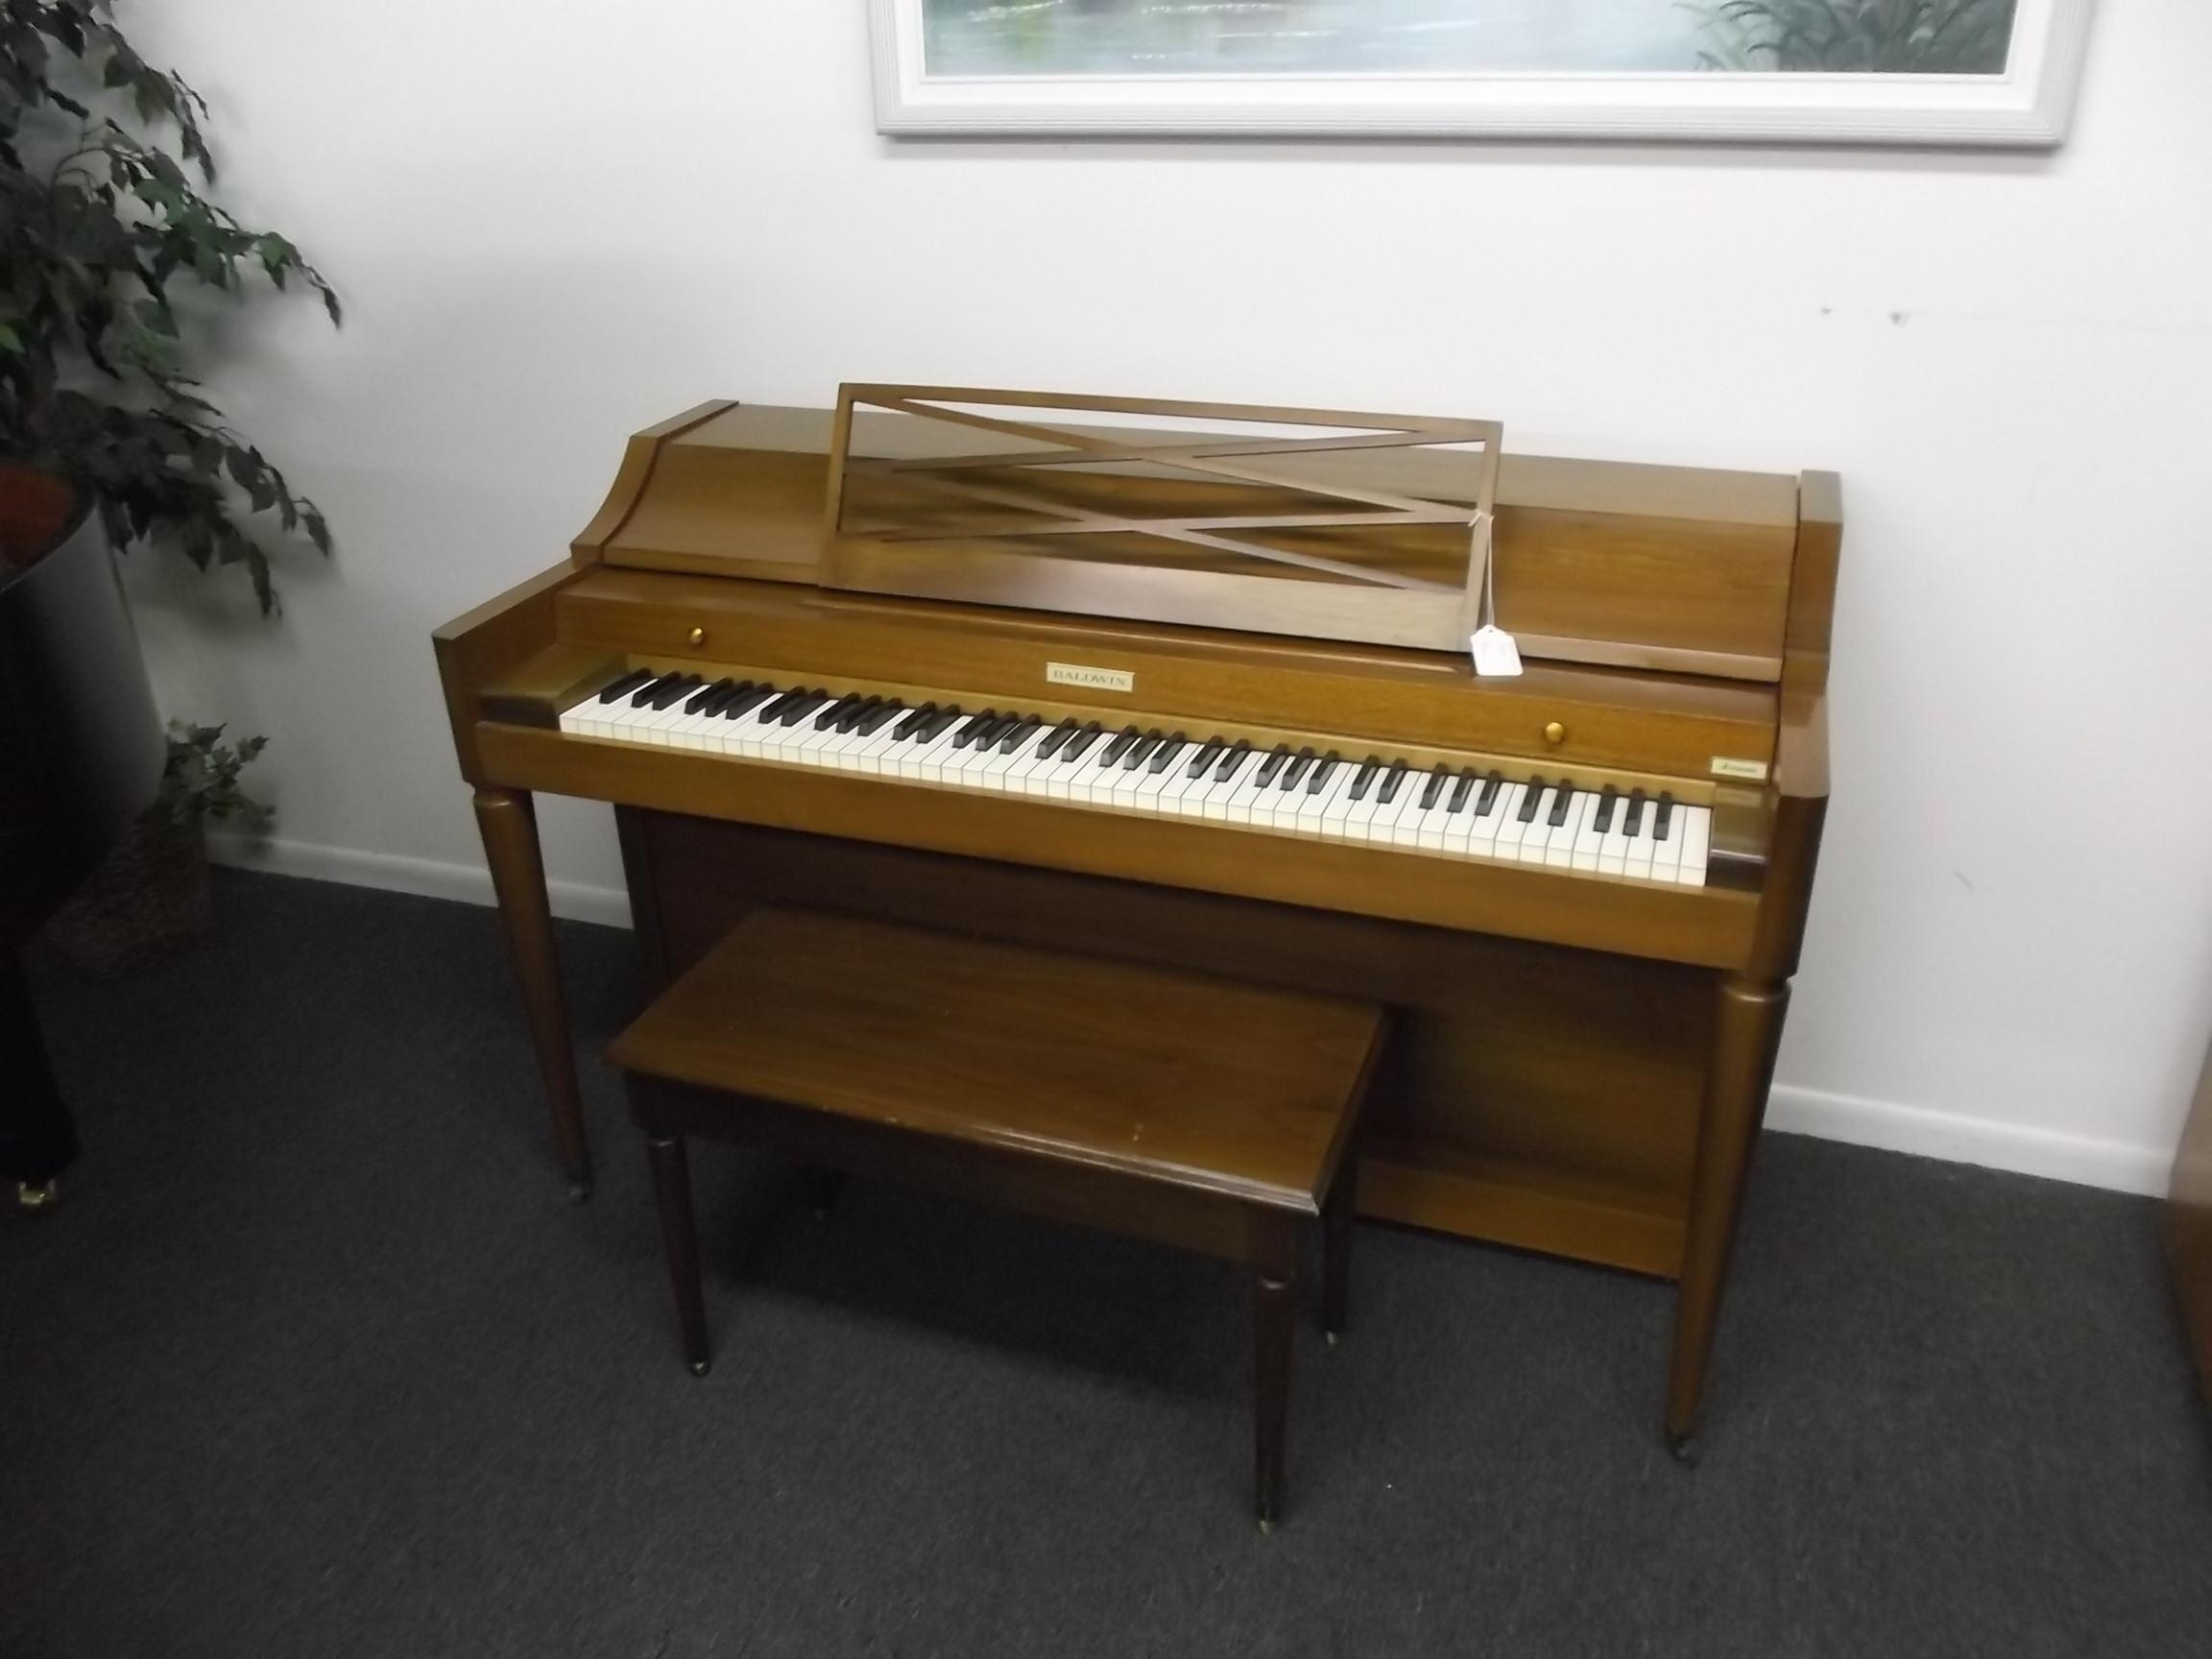 Used upright pianos - Yamaha console piano models ...